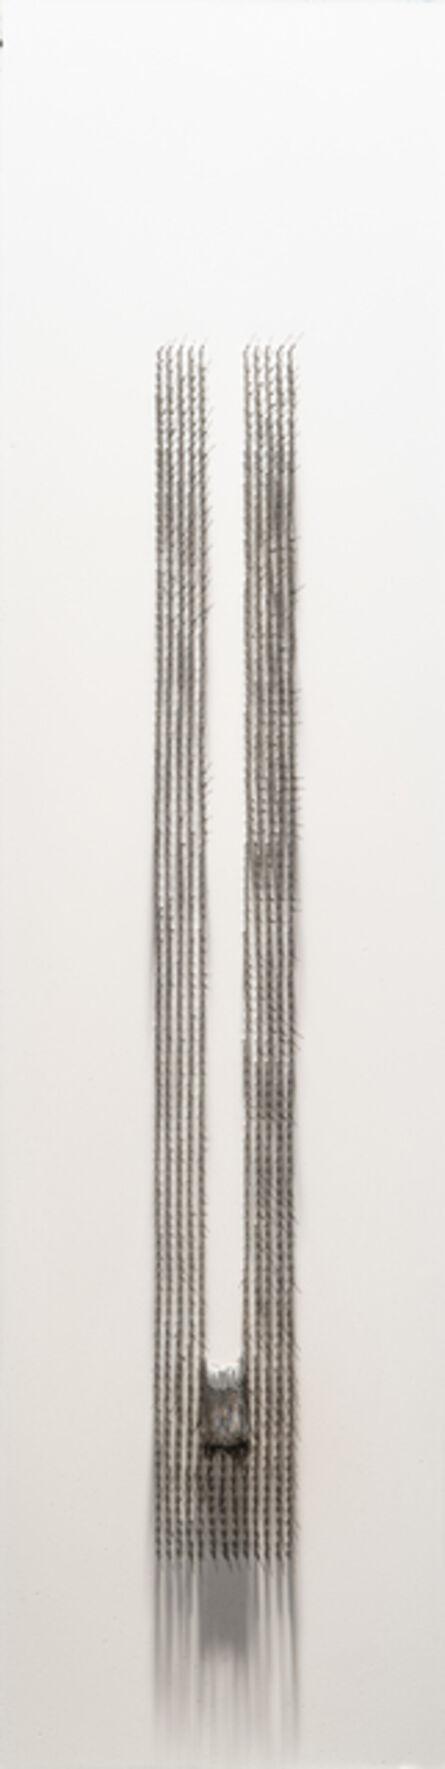 Sohn Paa, 'Composition N5', 2018